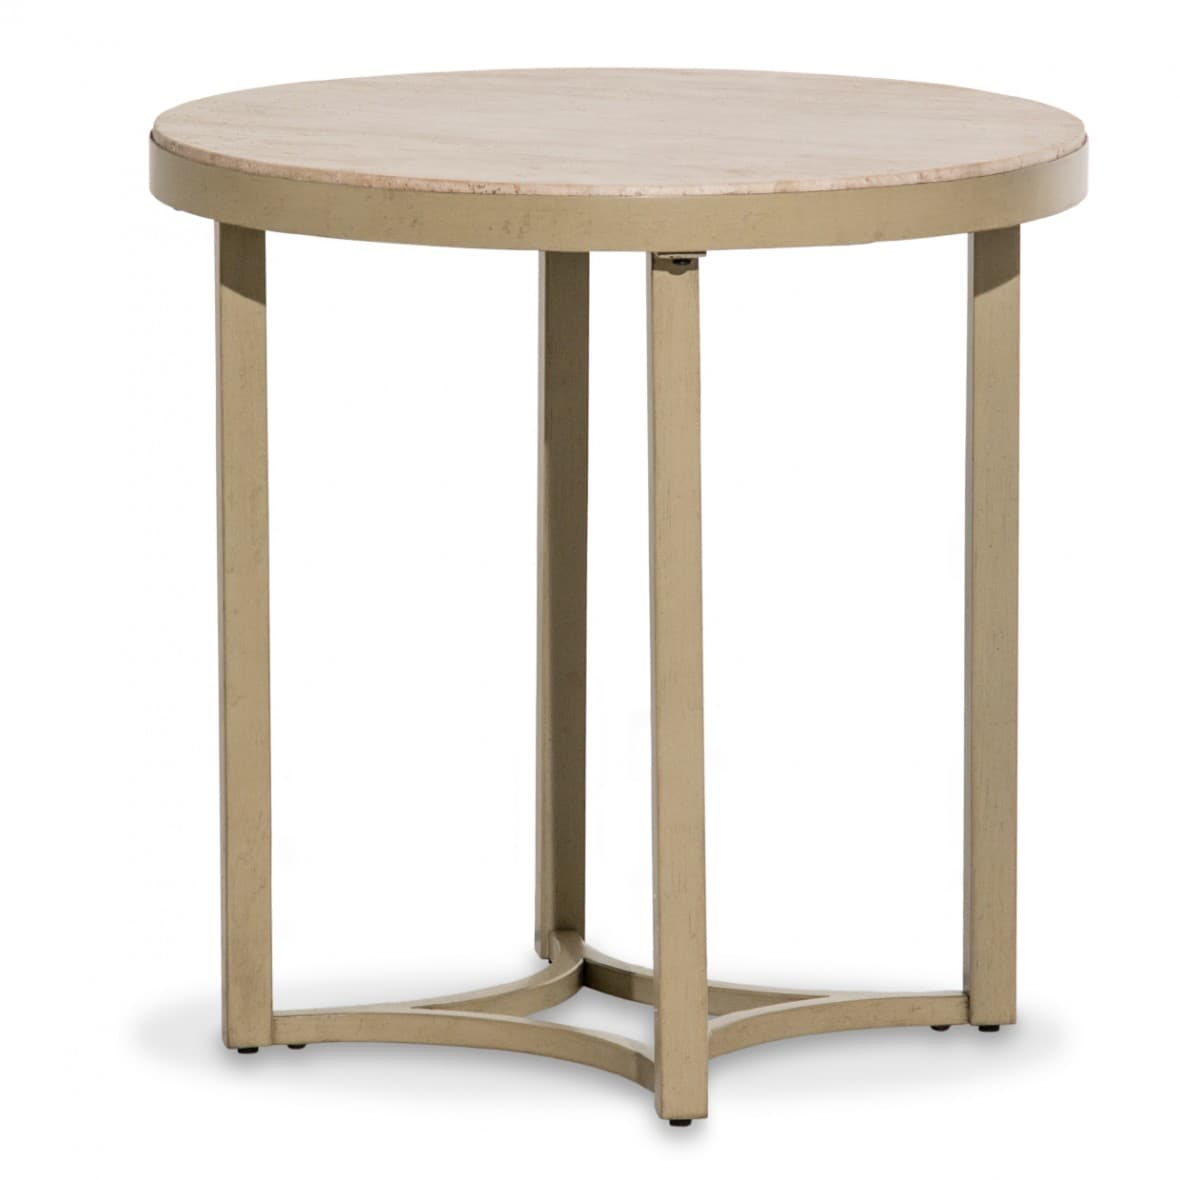 Alta Круглый приставной стол, топ мрамор Travertine